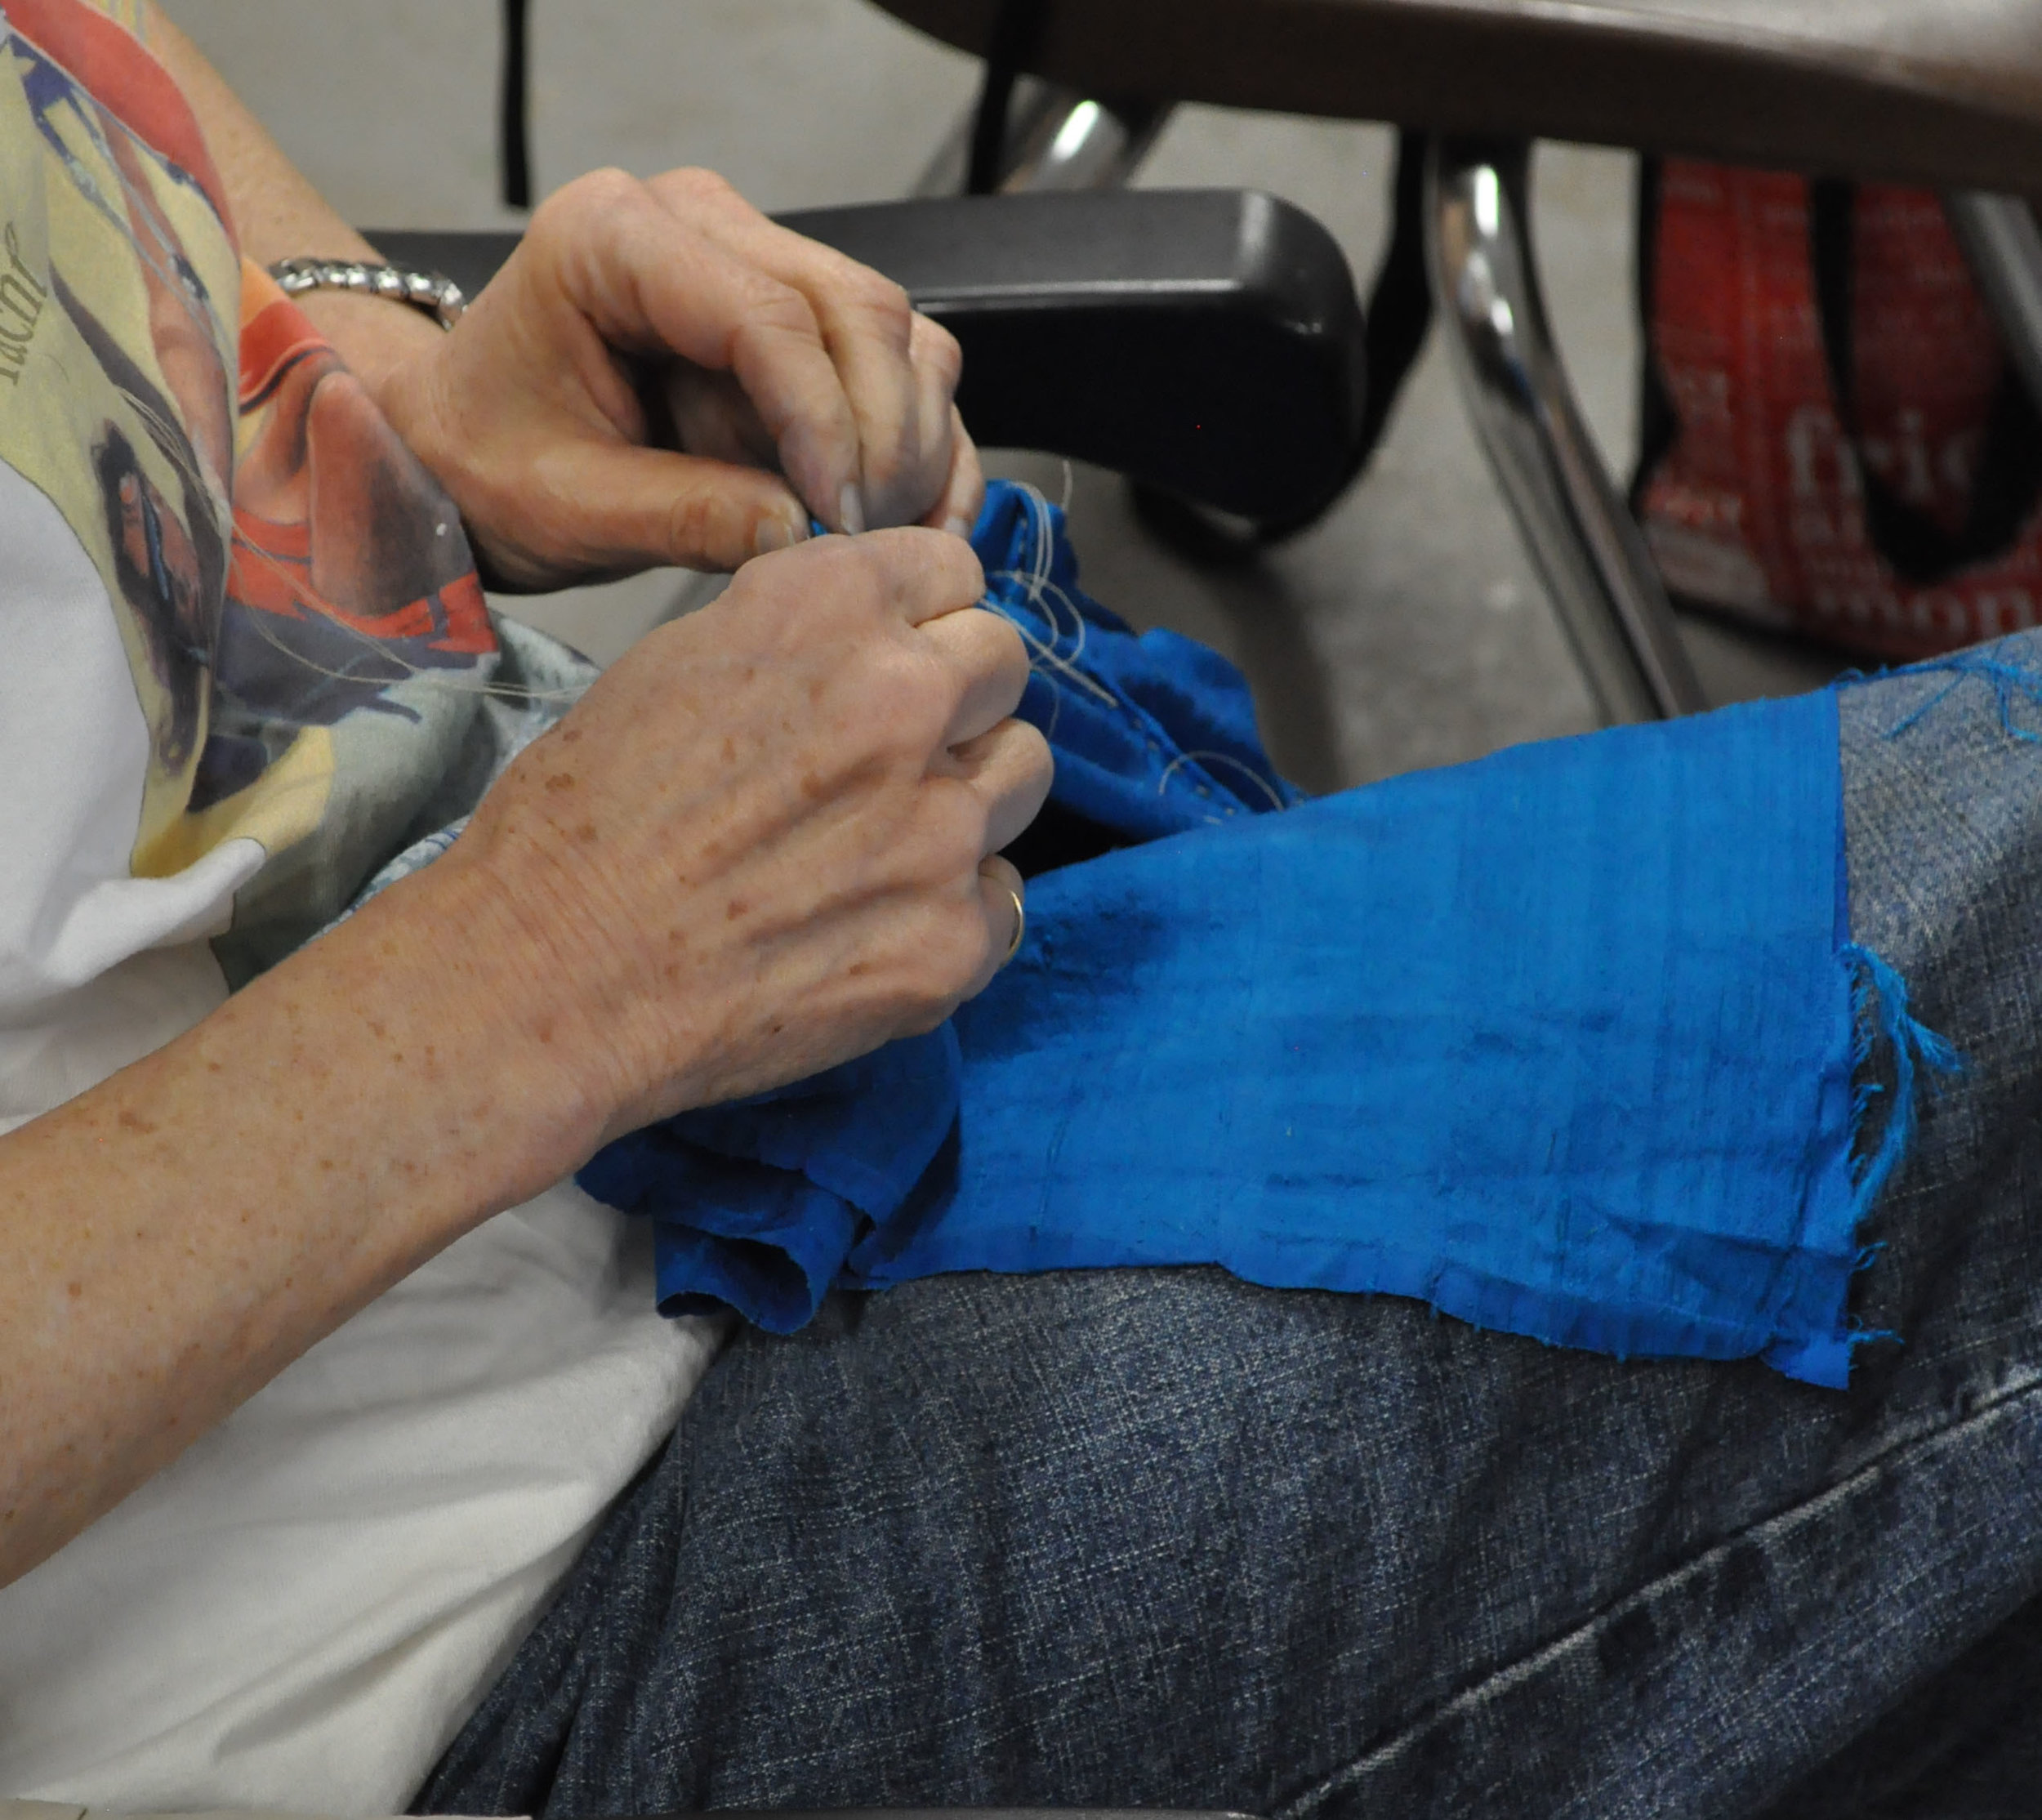 shibori-stitching.jpg